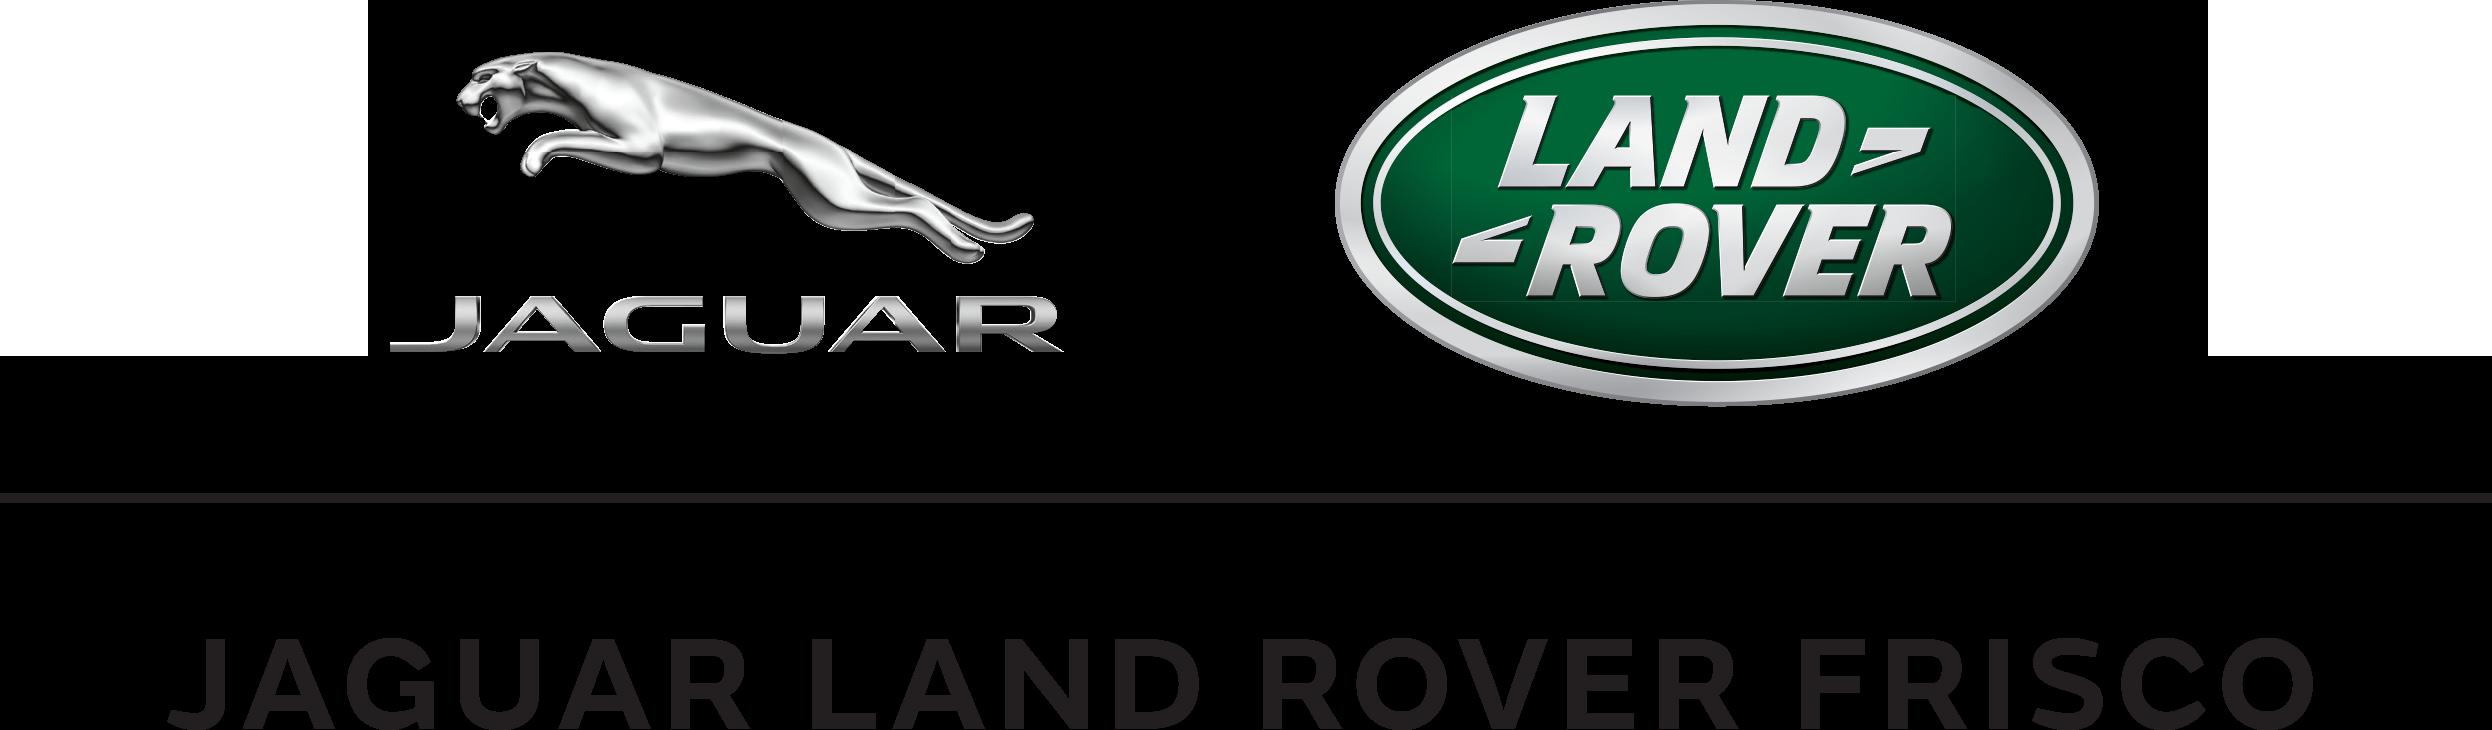 Jaguar Land Rover Frisco